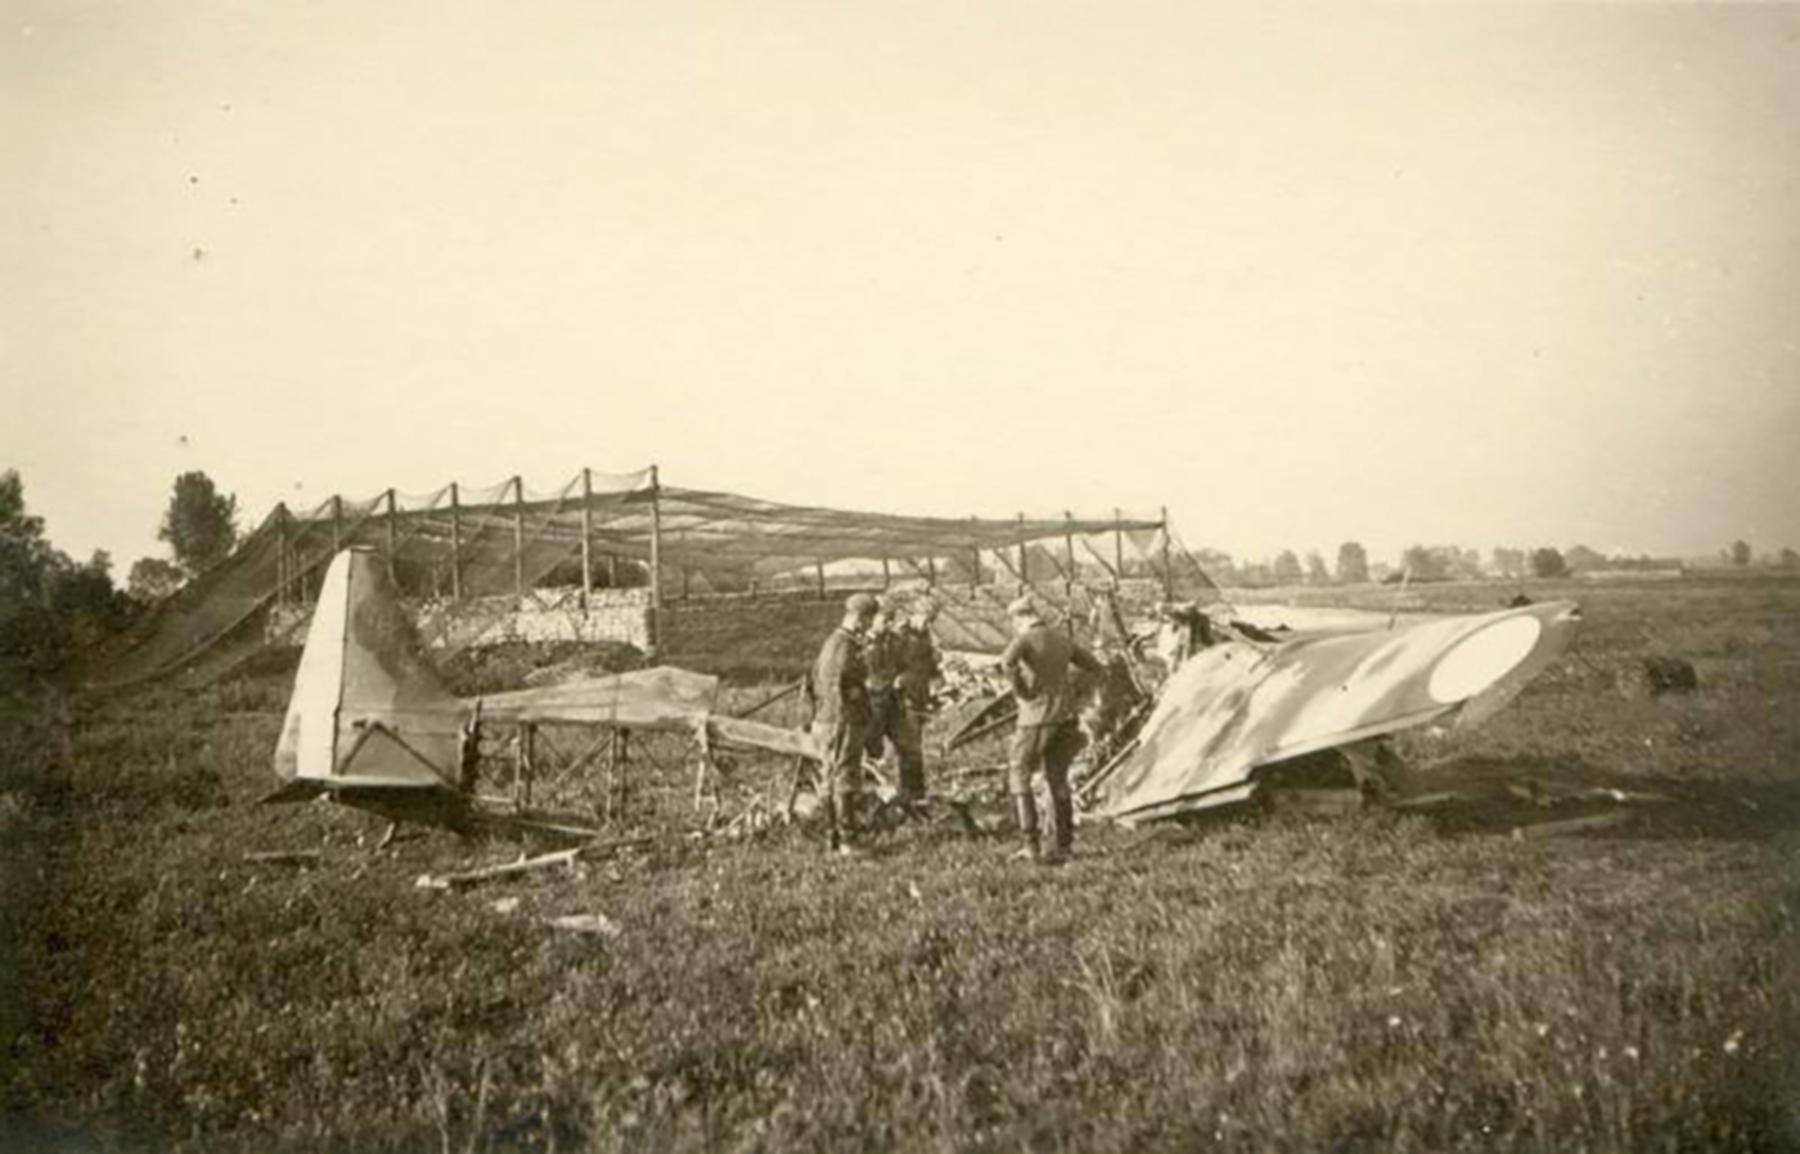 French Airforce Morane Saulnier MS 406C1 destroyed at its base France May Jun 1940 ebay 01